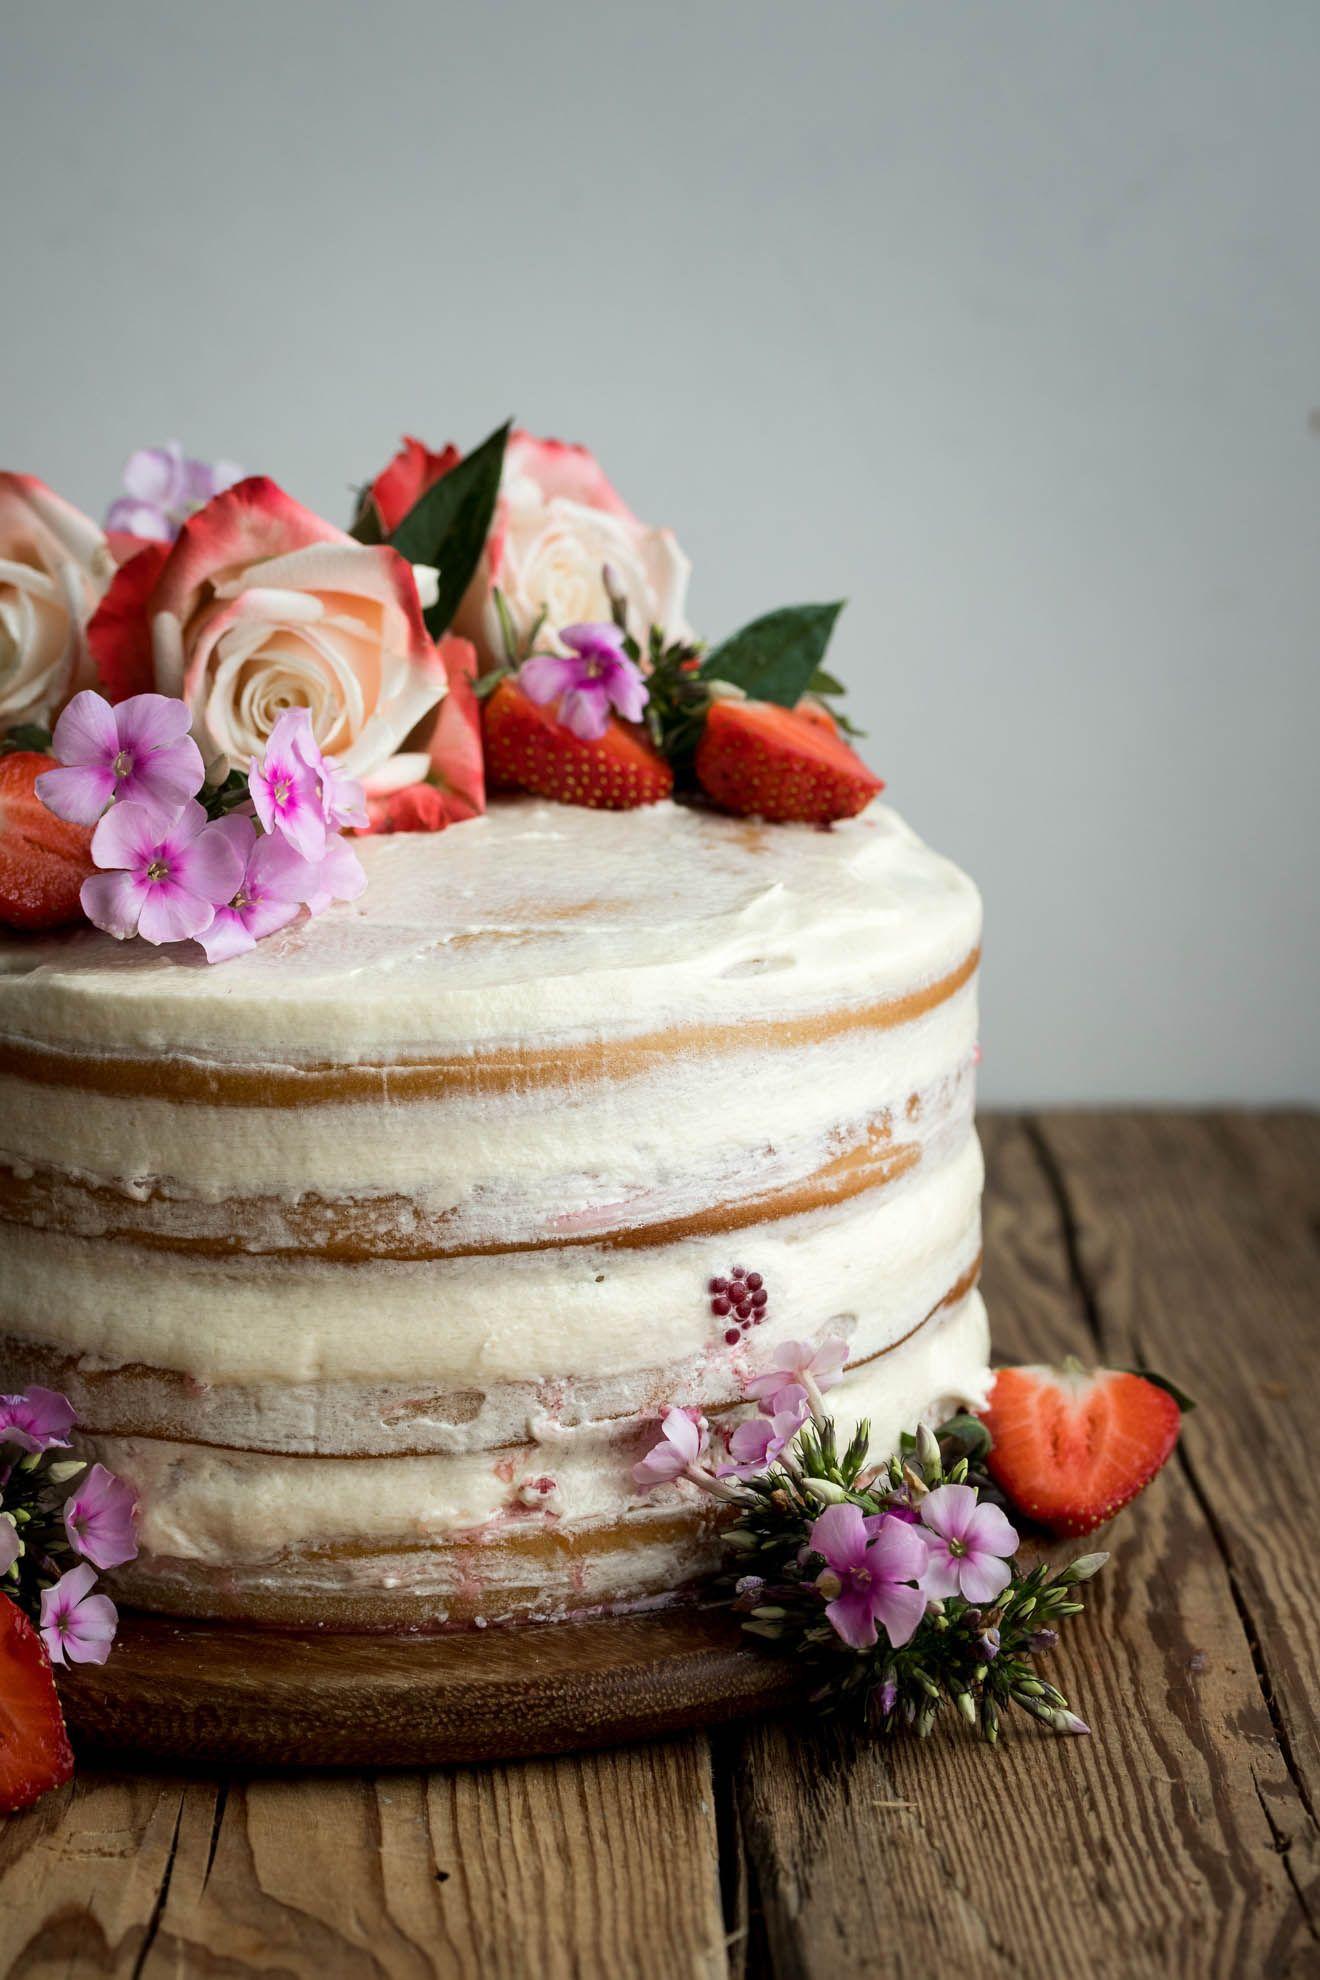 Vegan Vanilla And Berry Layer Cake Recipe In 2020 Vegan